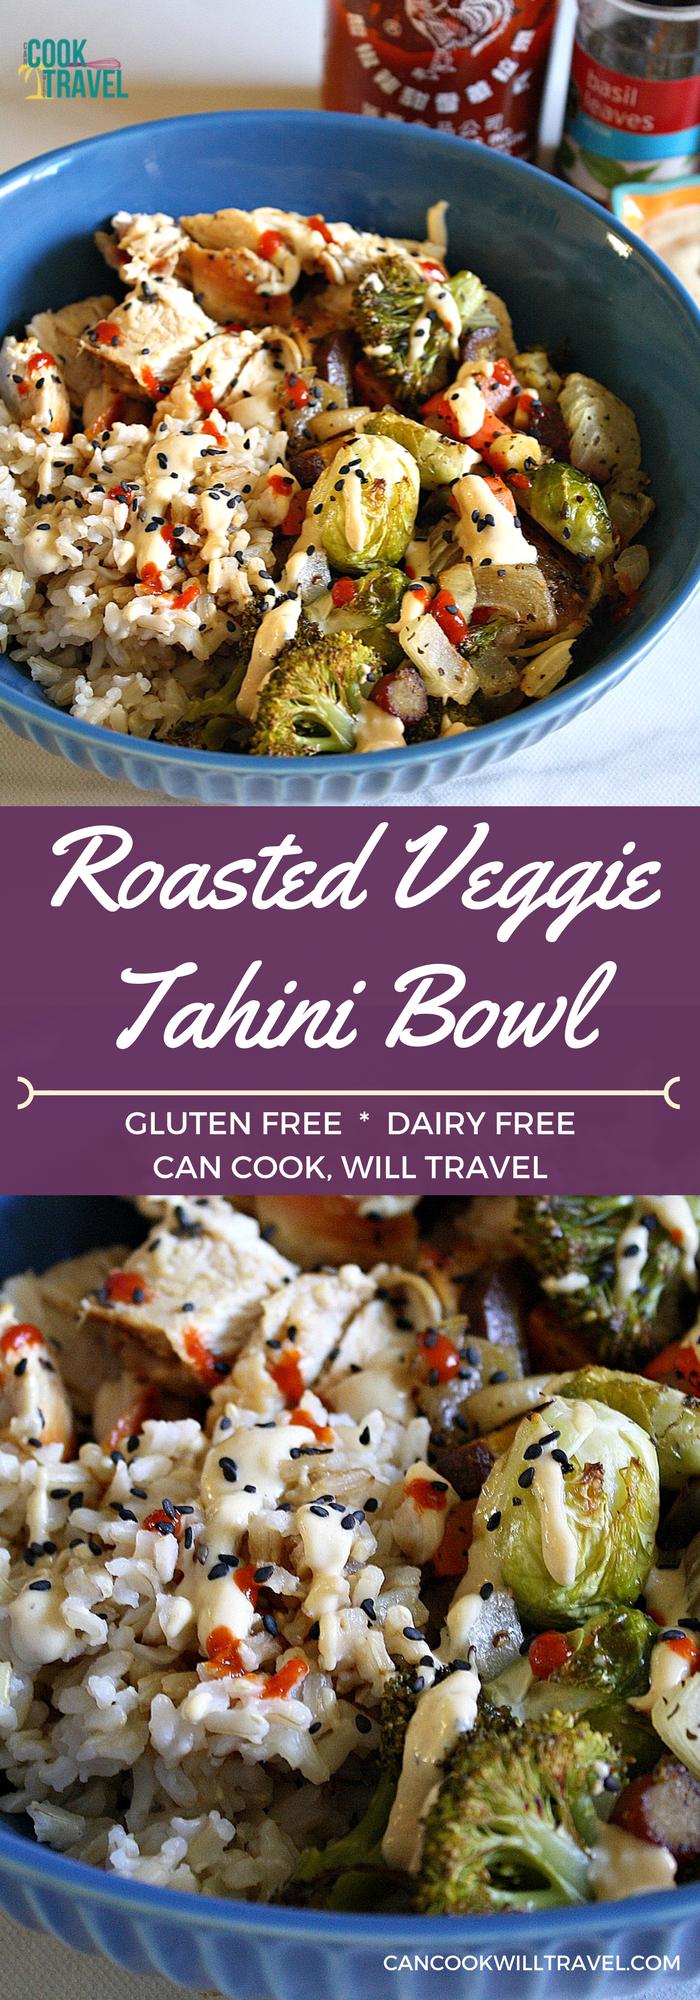 Roasted Veggie Tahini Bowl_Collage1